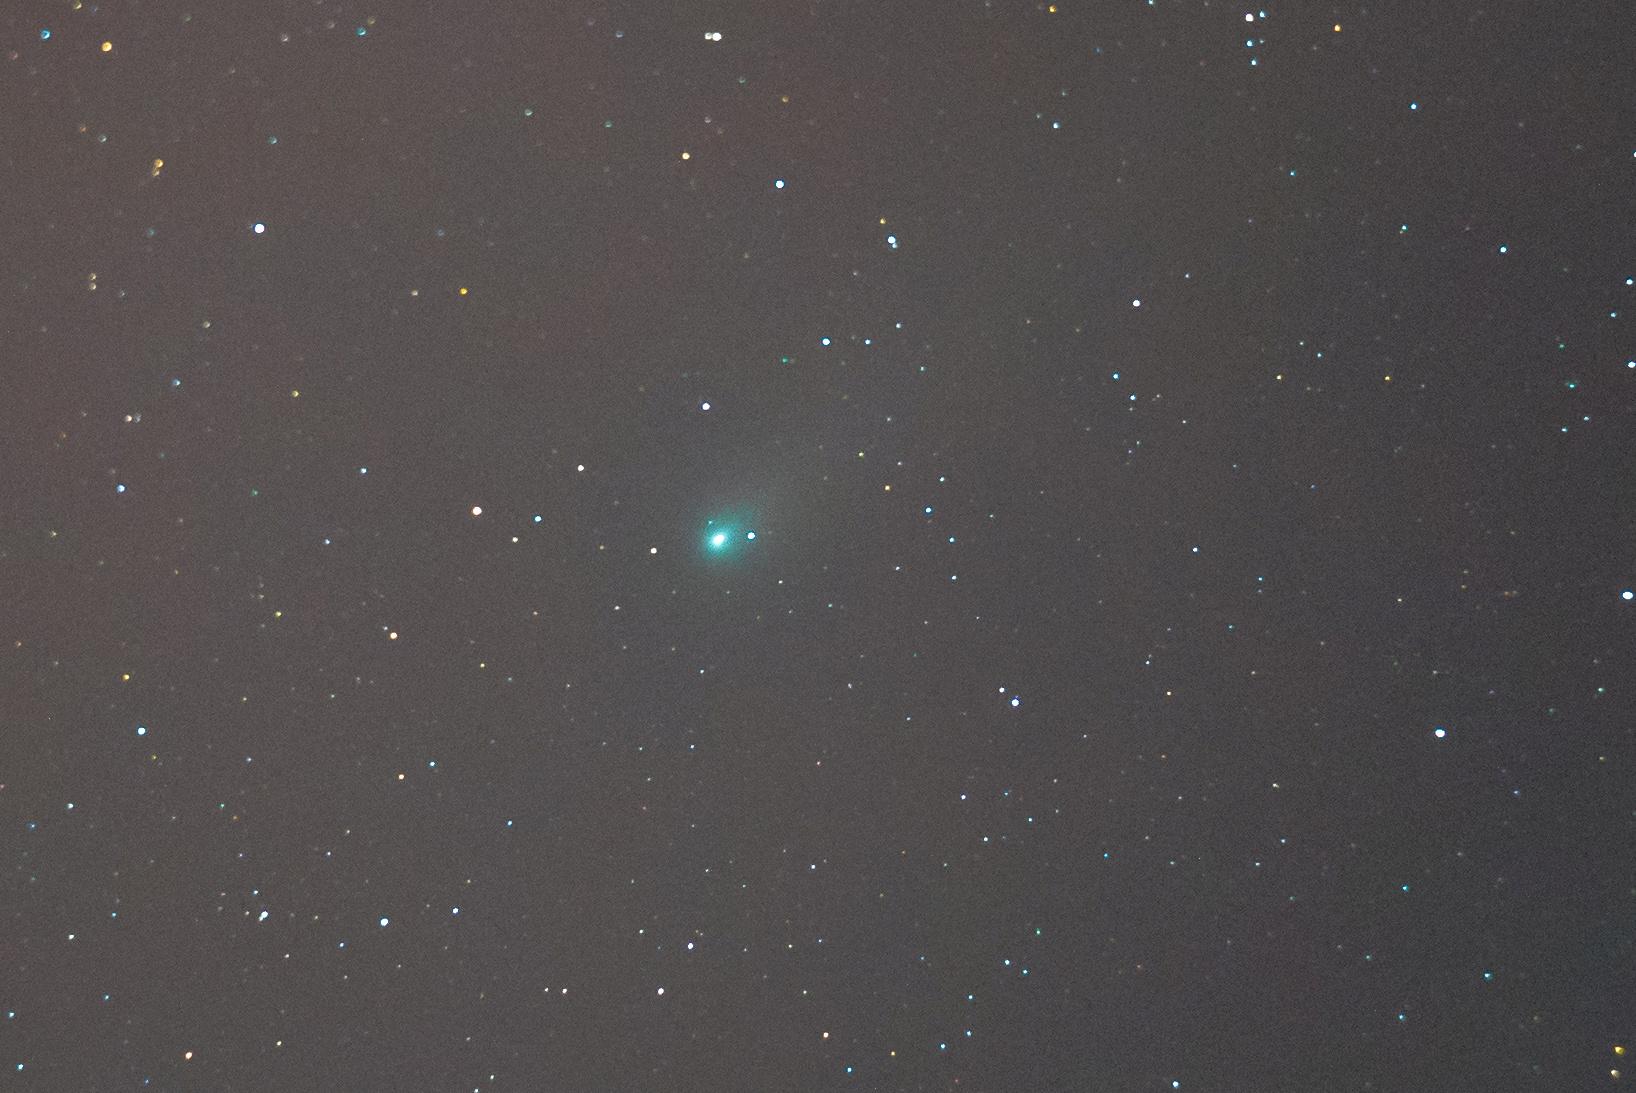 Comète 21P/Giacobini-Zinner Dsc08910